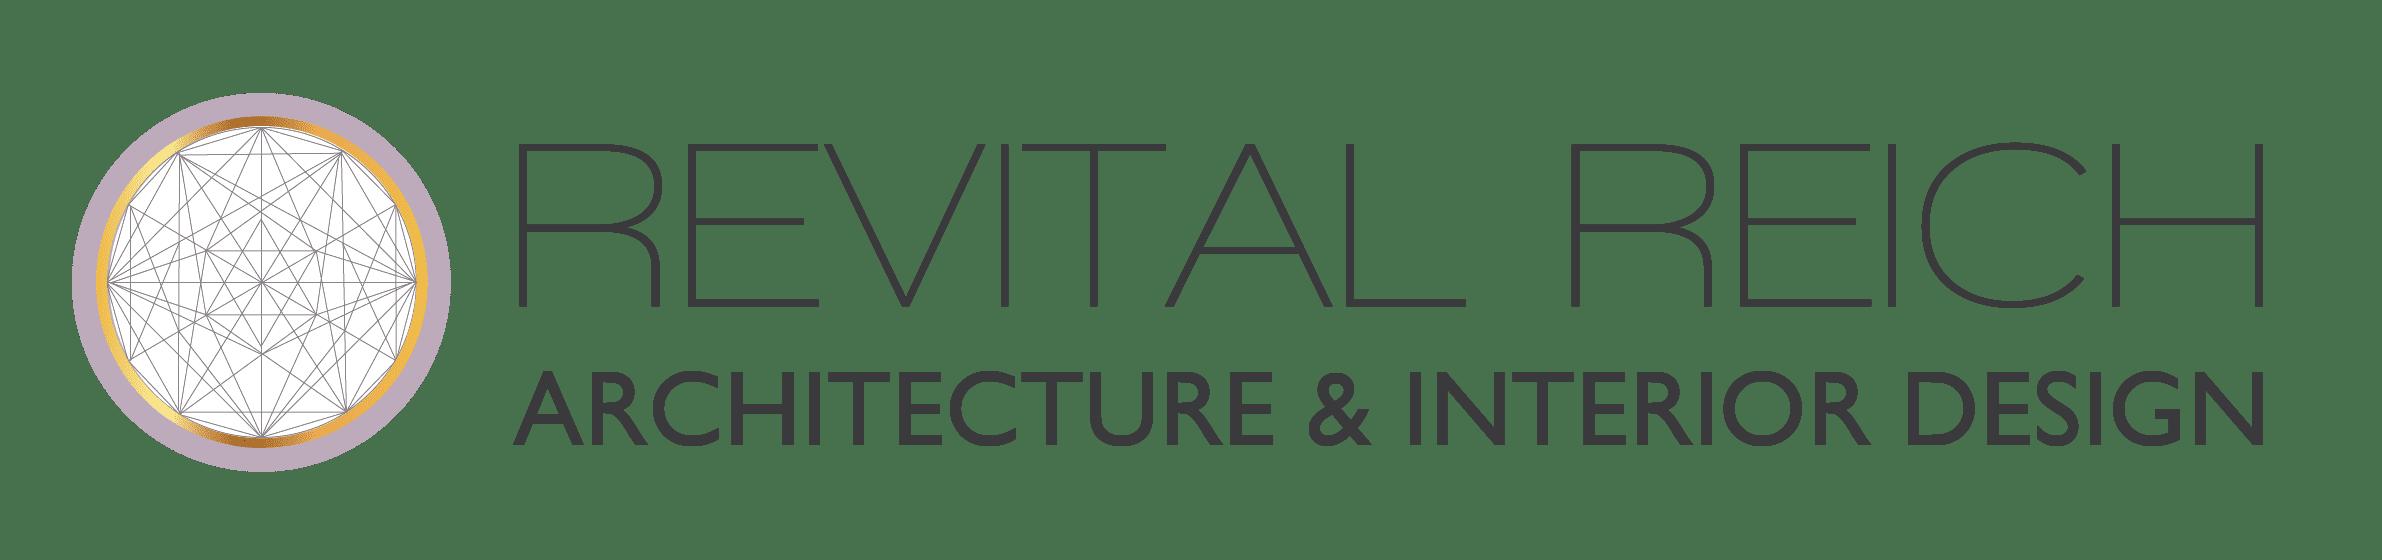 רויטל רייך – אדריכלות ועיצוב פנים